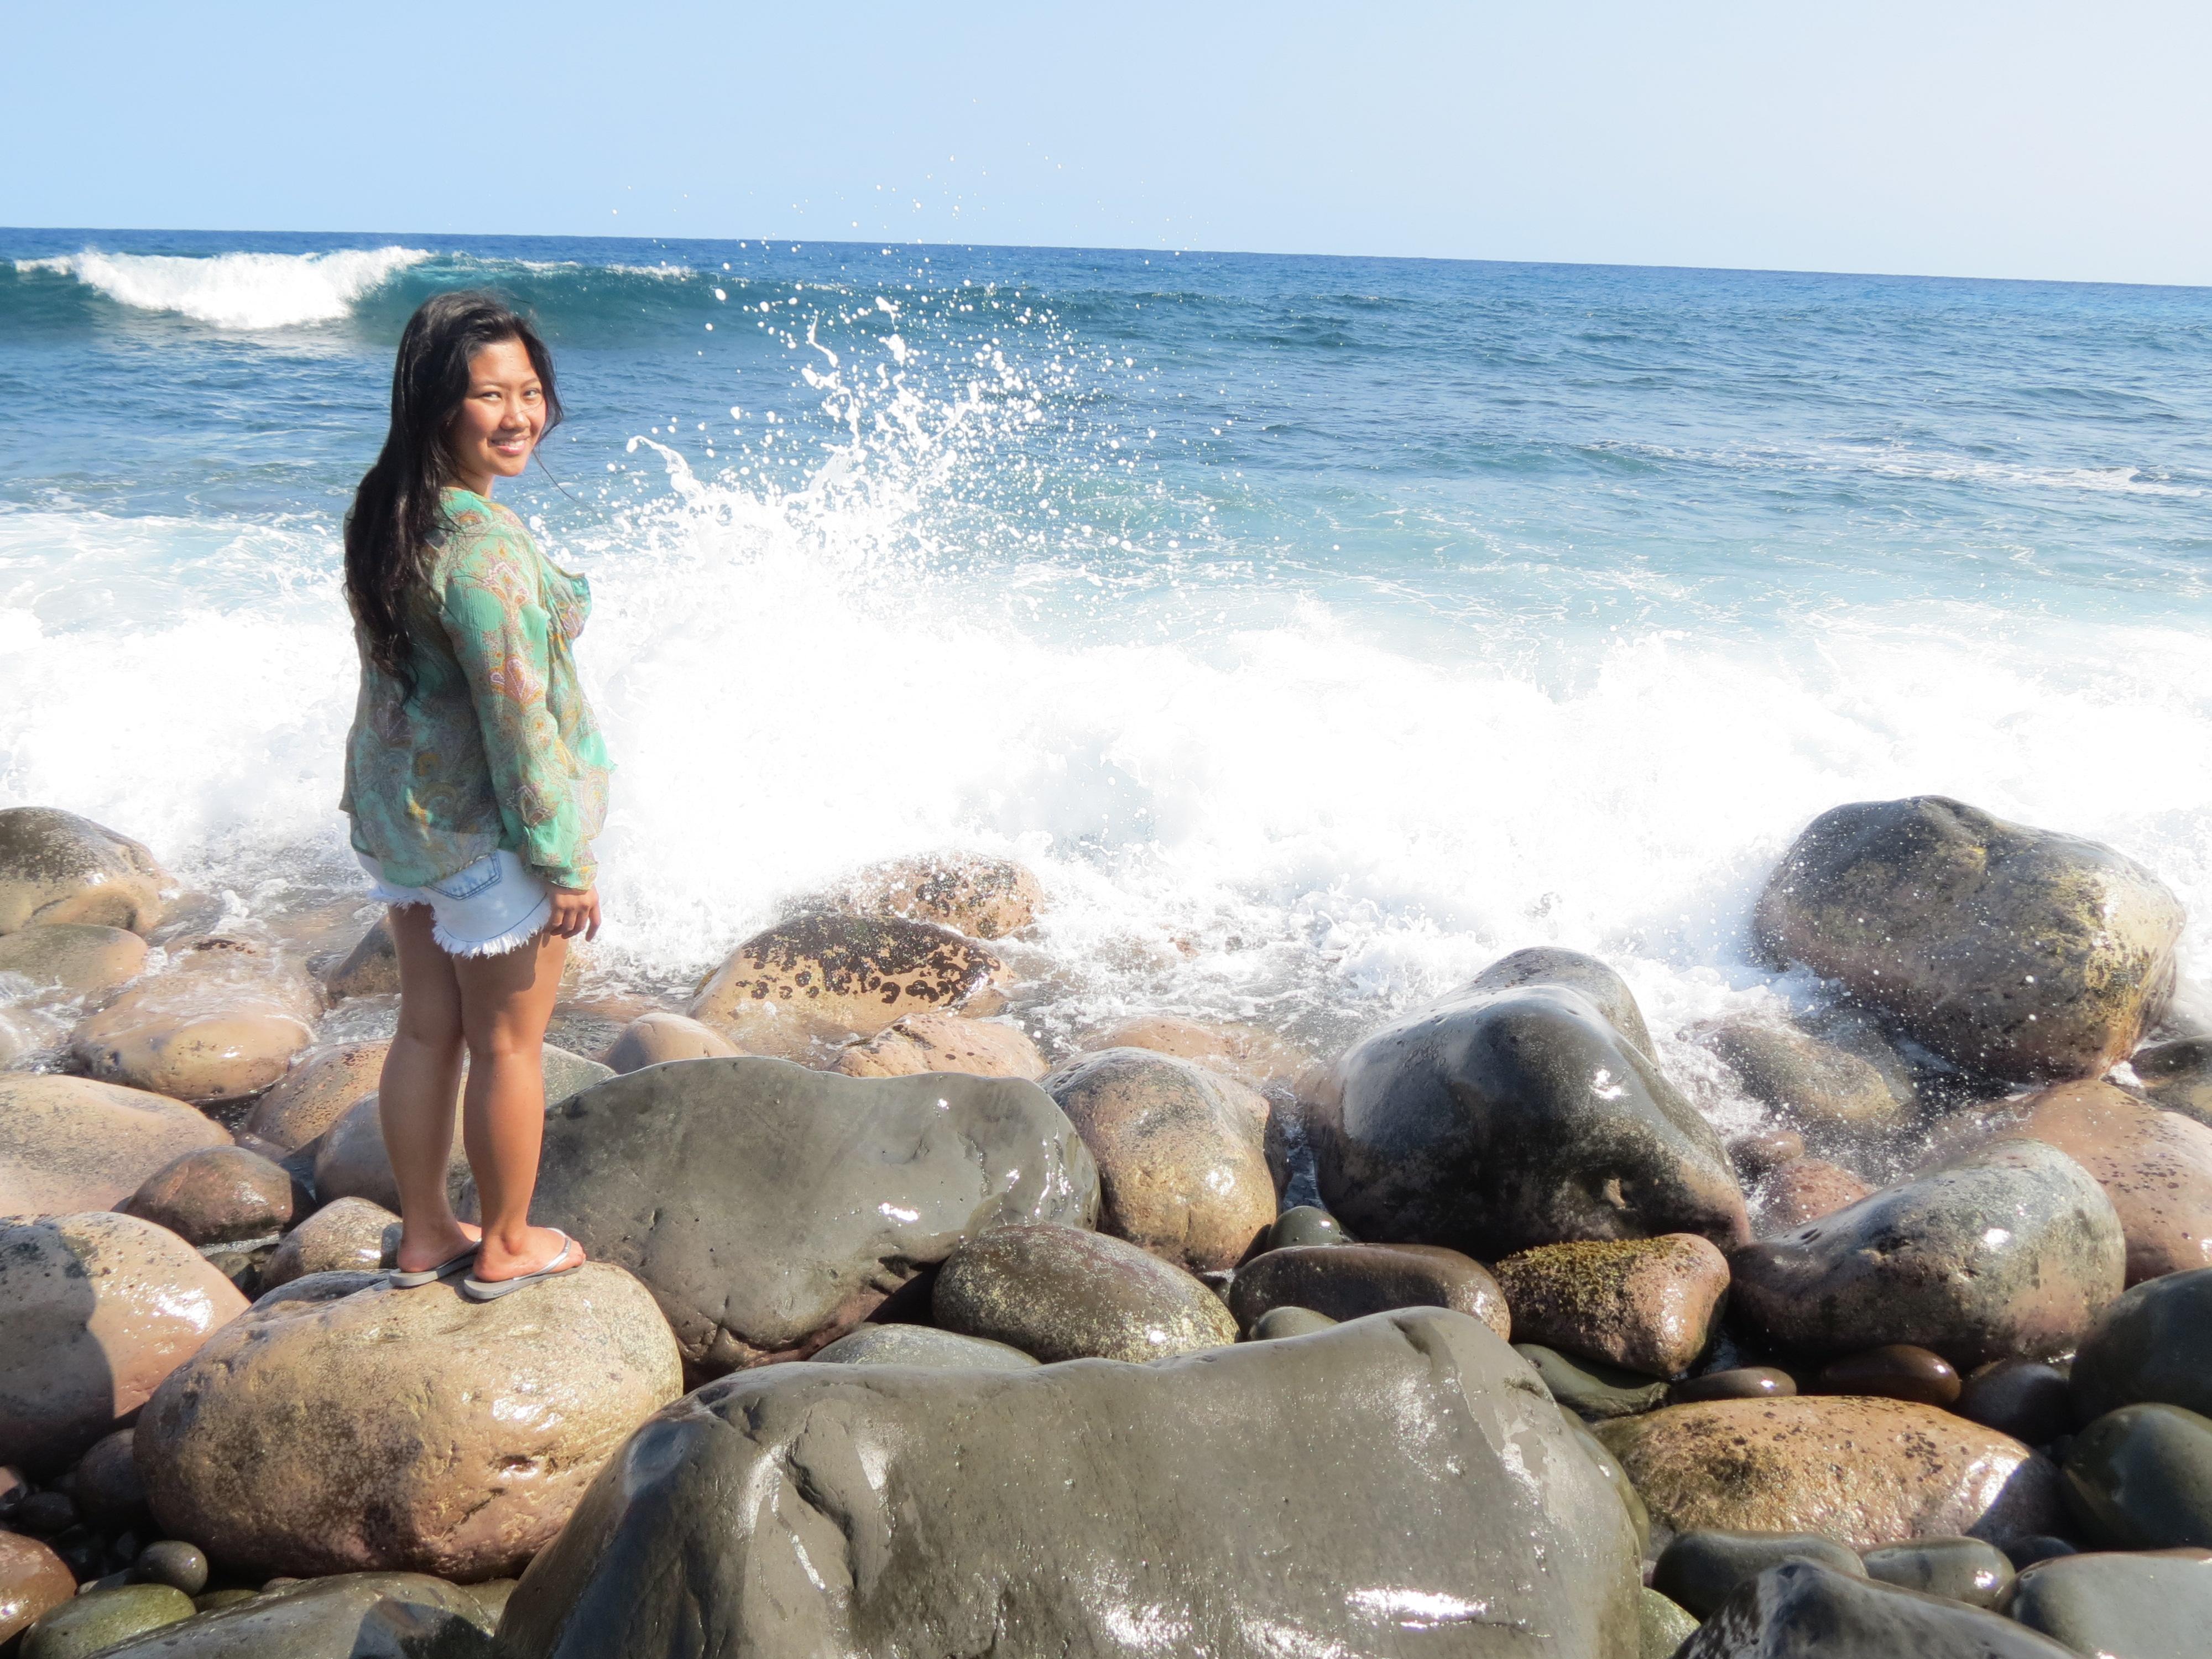 Strong waves smashing against volcanic rocks